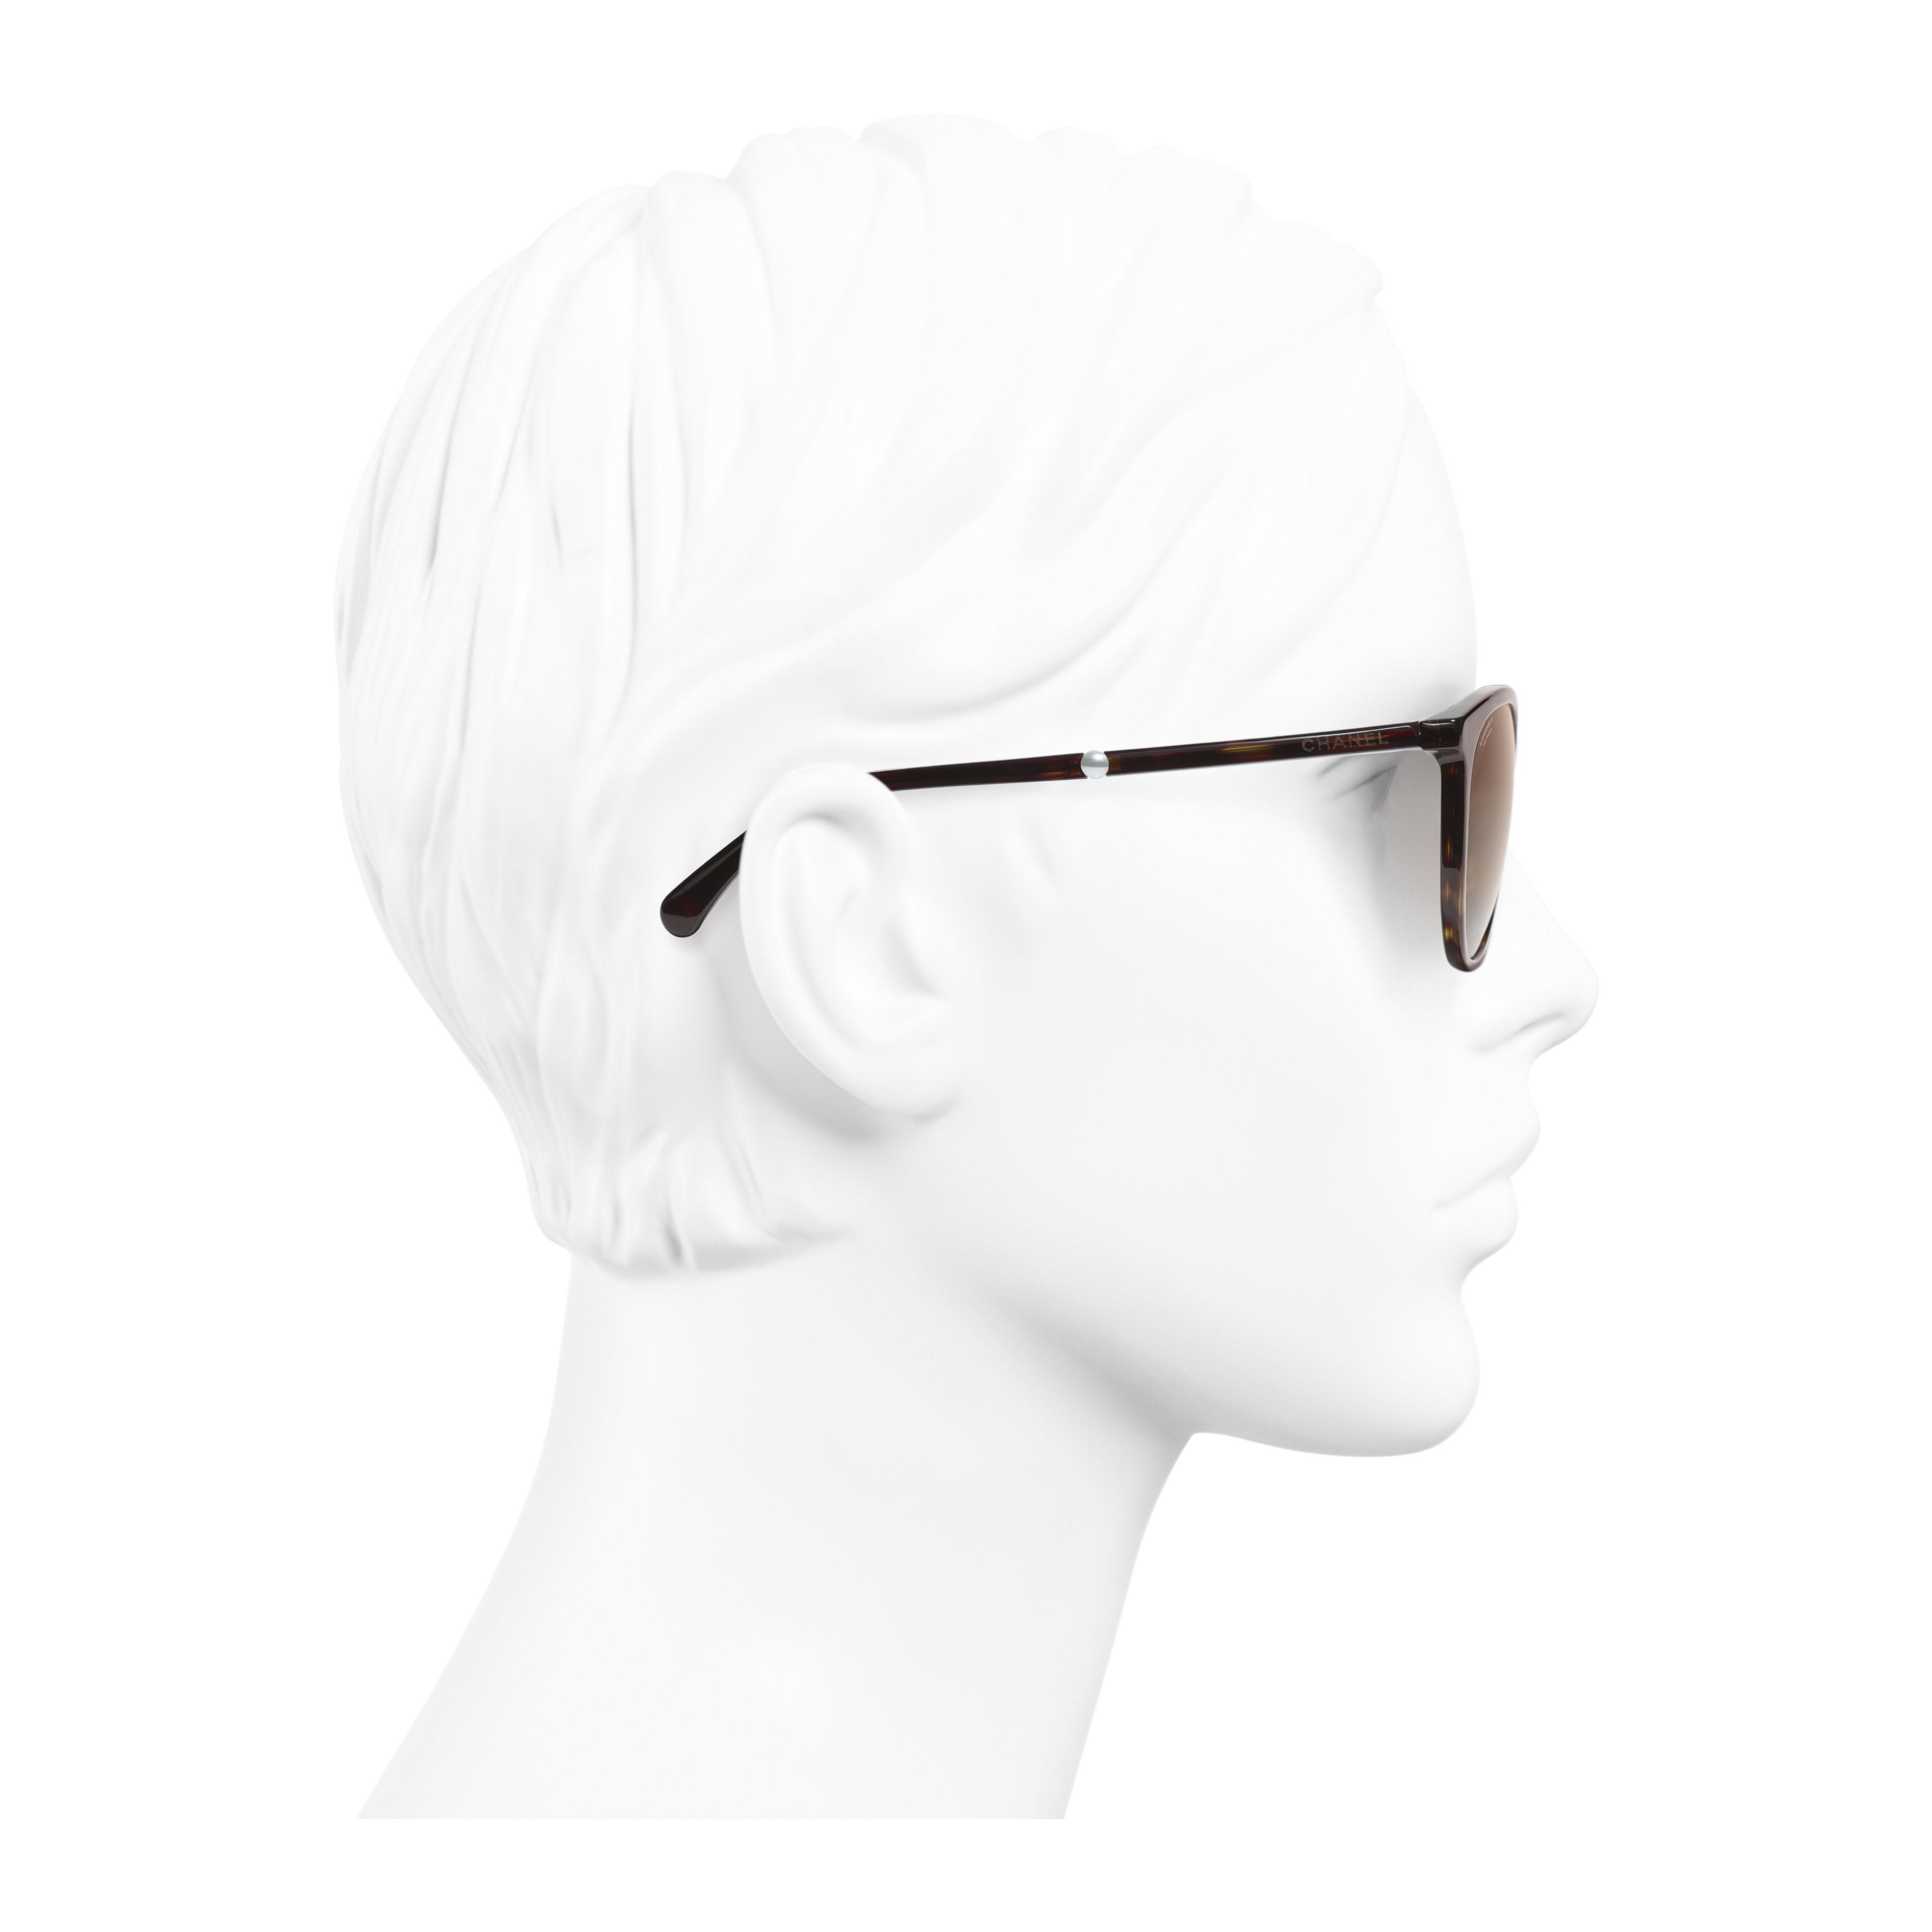 Butterfly Sunglasses Acetate & Imitation Pearls - Polarized Lenses Dark Tortoise - - see full sized version